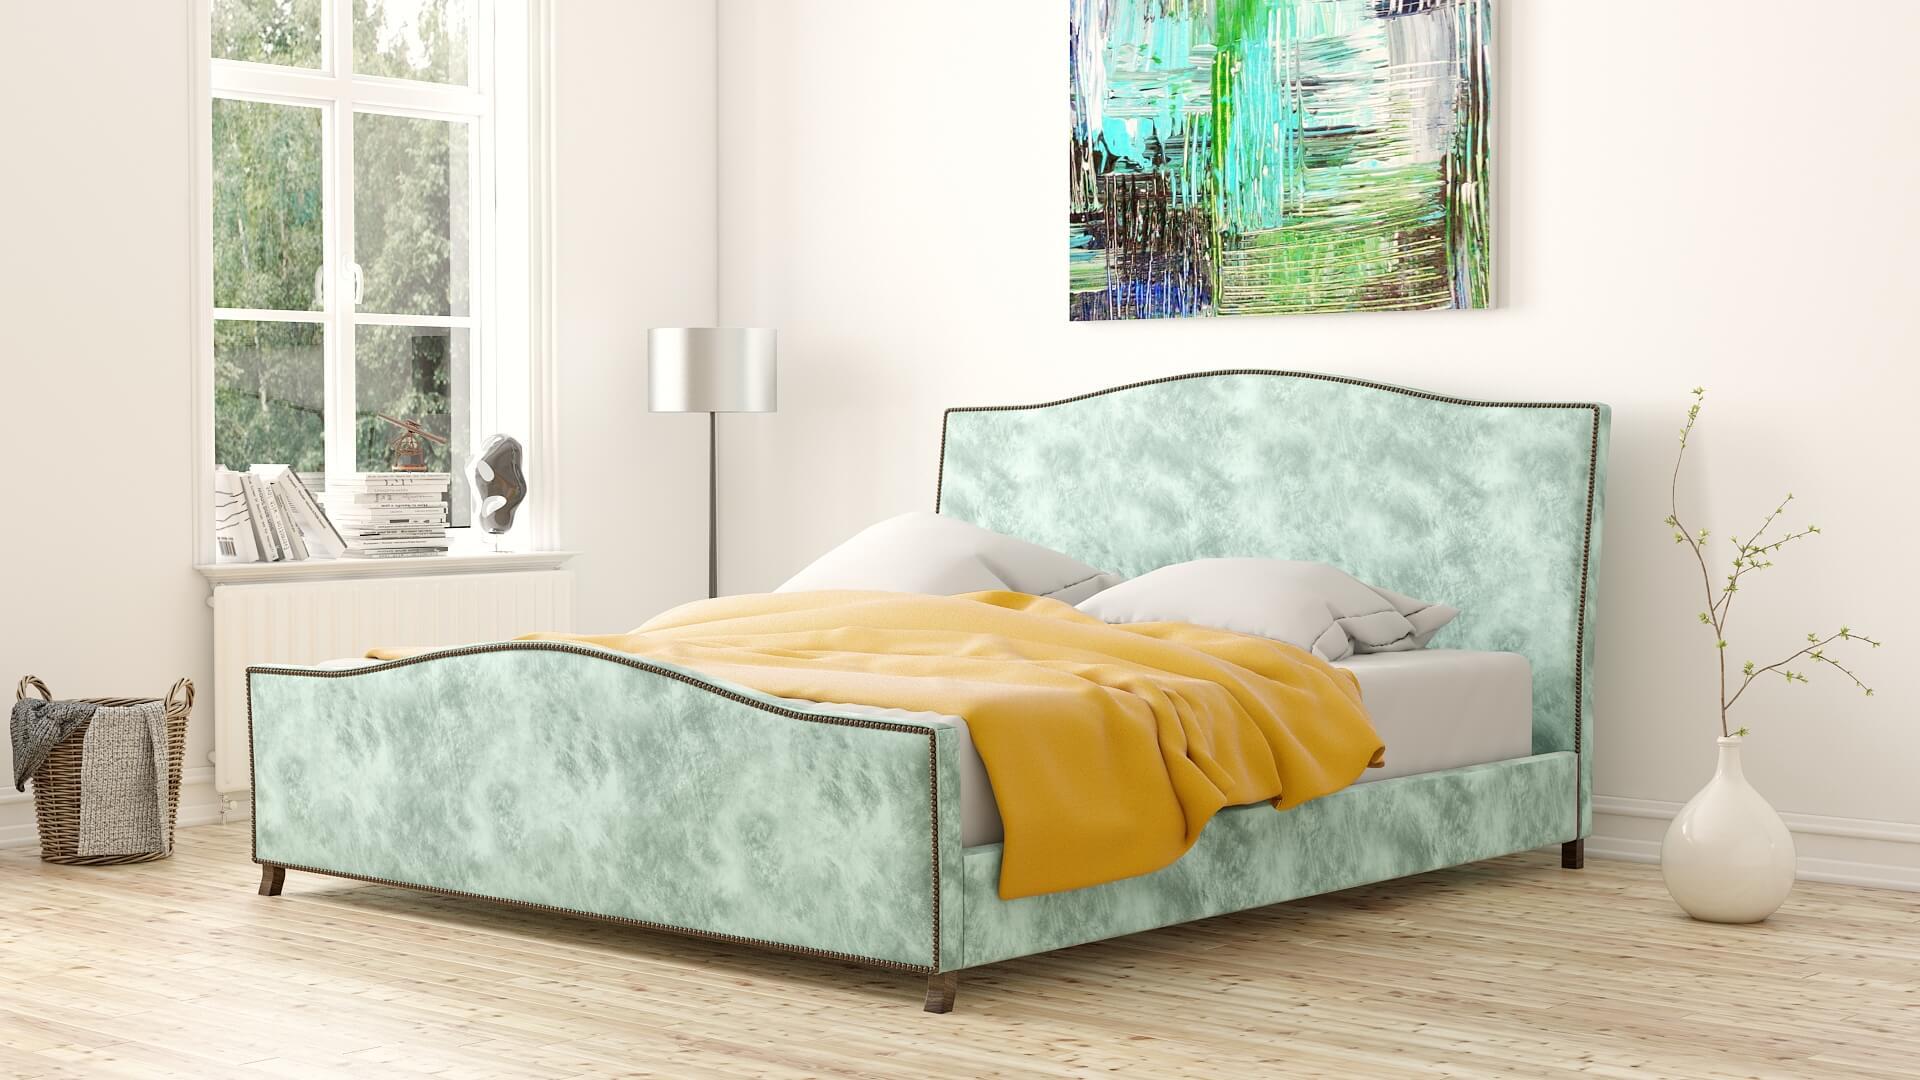 prato bed furniture gallery 3